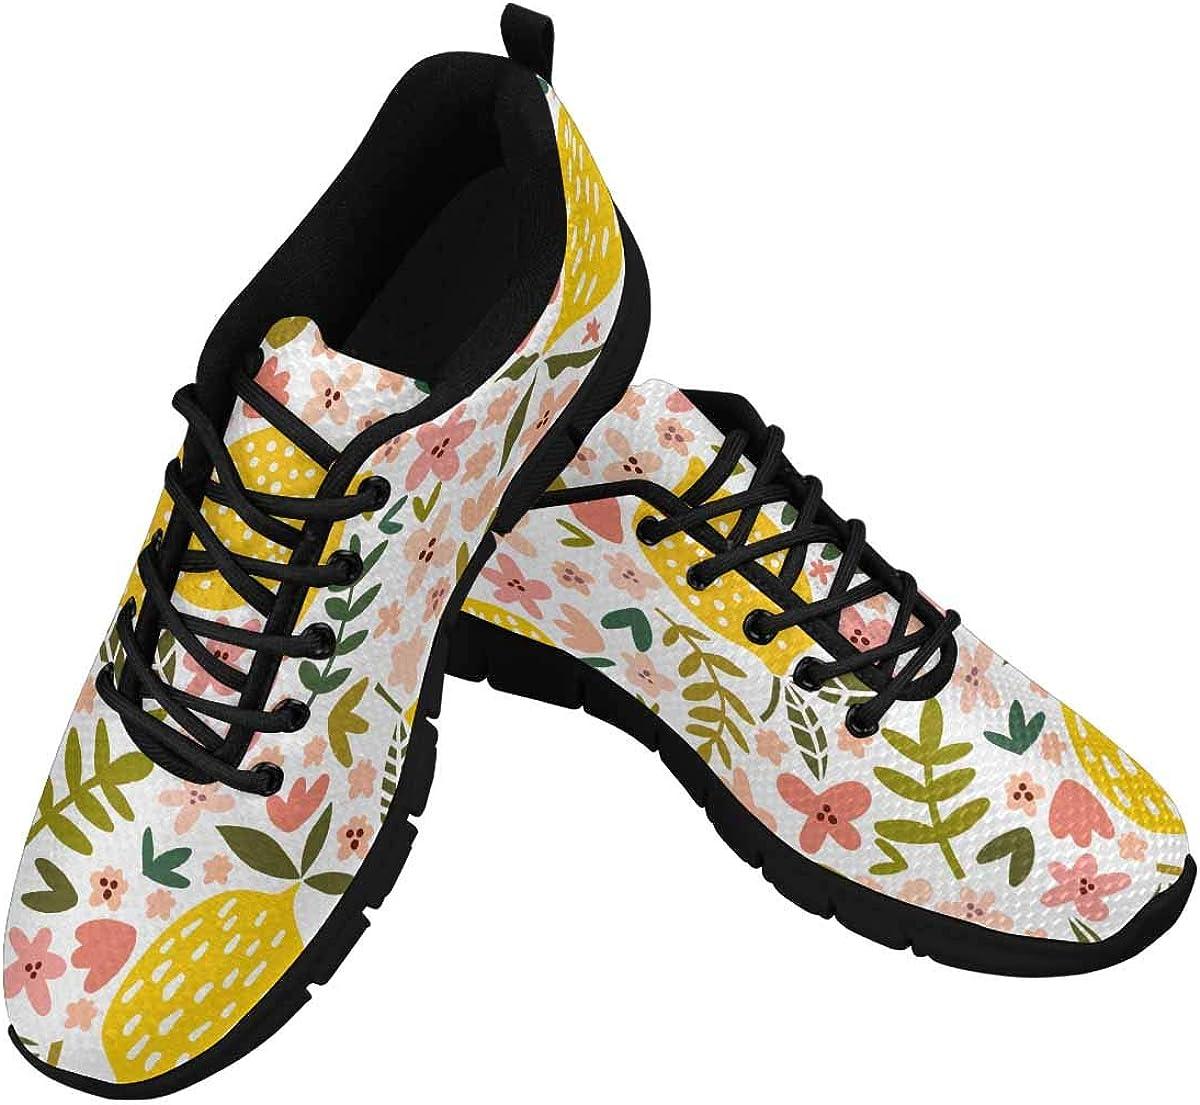 InterestPrint Flower and Lemon Pattern Women's Athletic Walking Shoes Comfort Mesh Non Slip